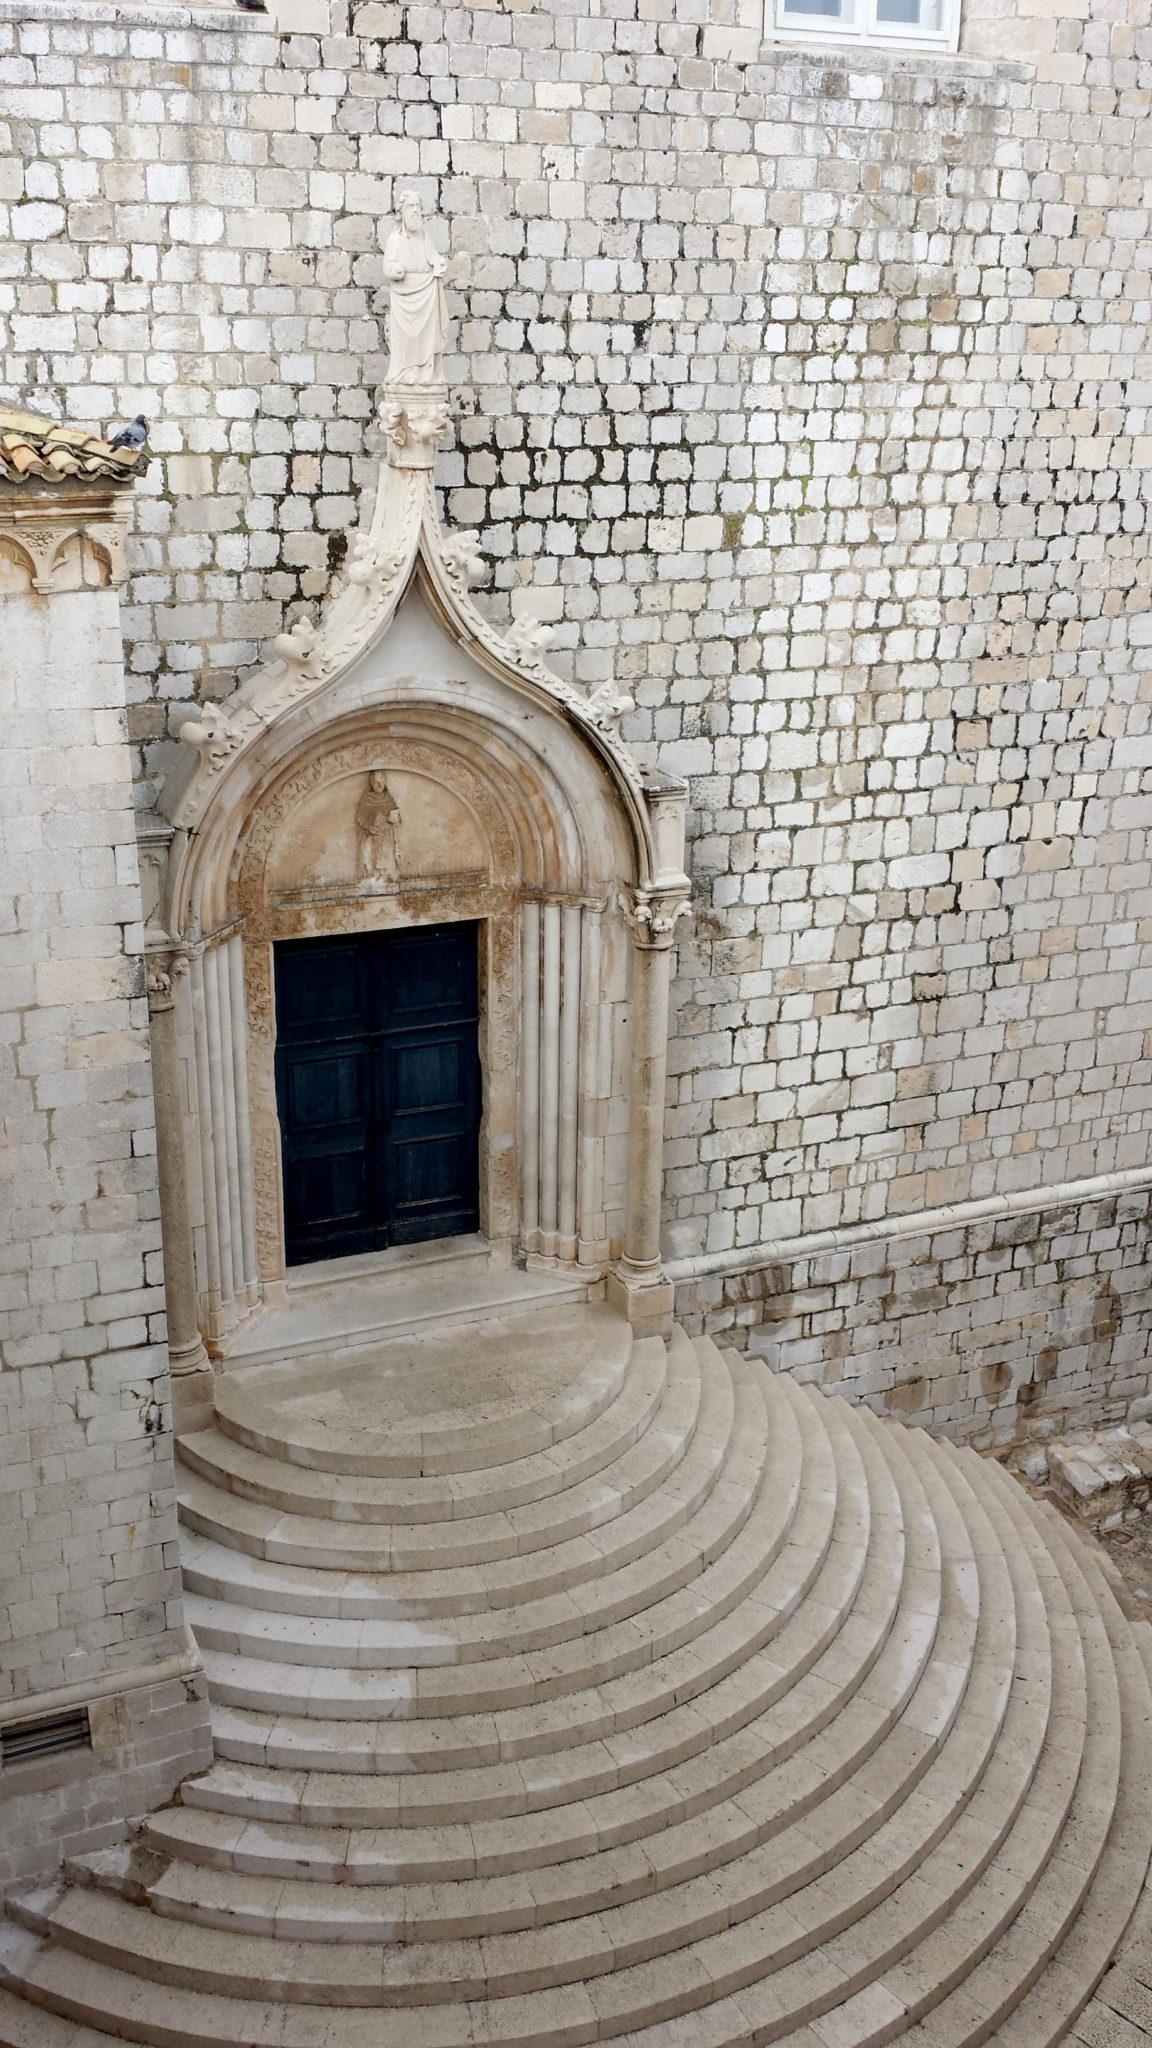 Hema_blog_mode_voyage_croatie_une_journee_a_dubrovnik_architecture_17